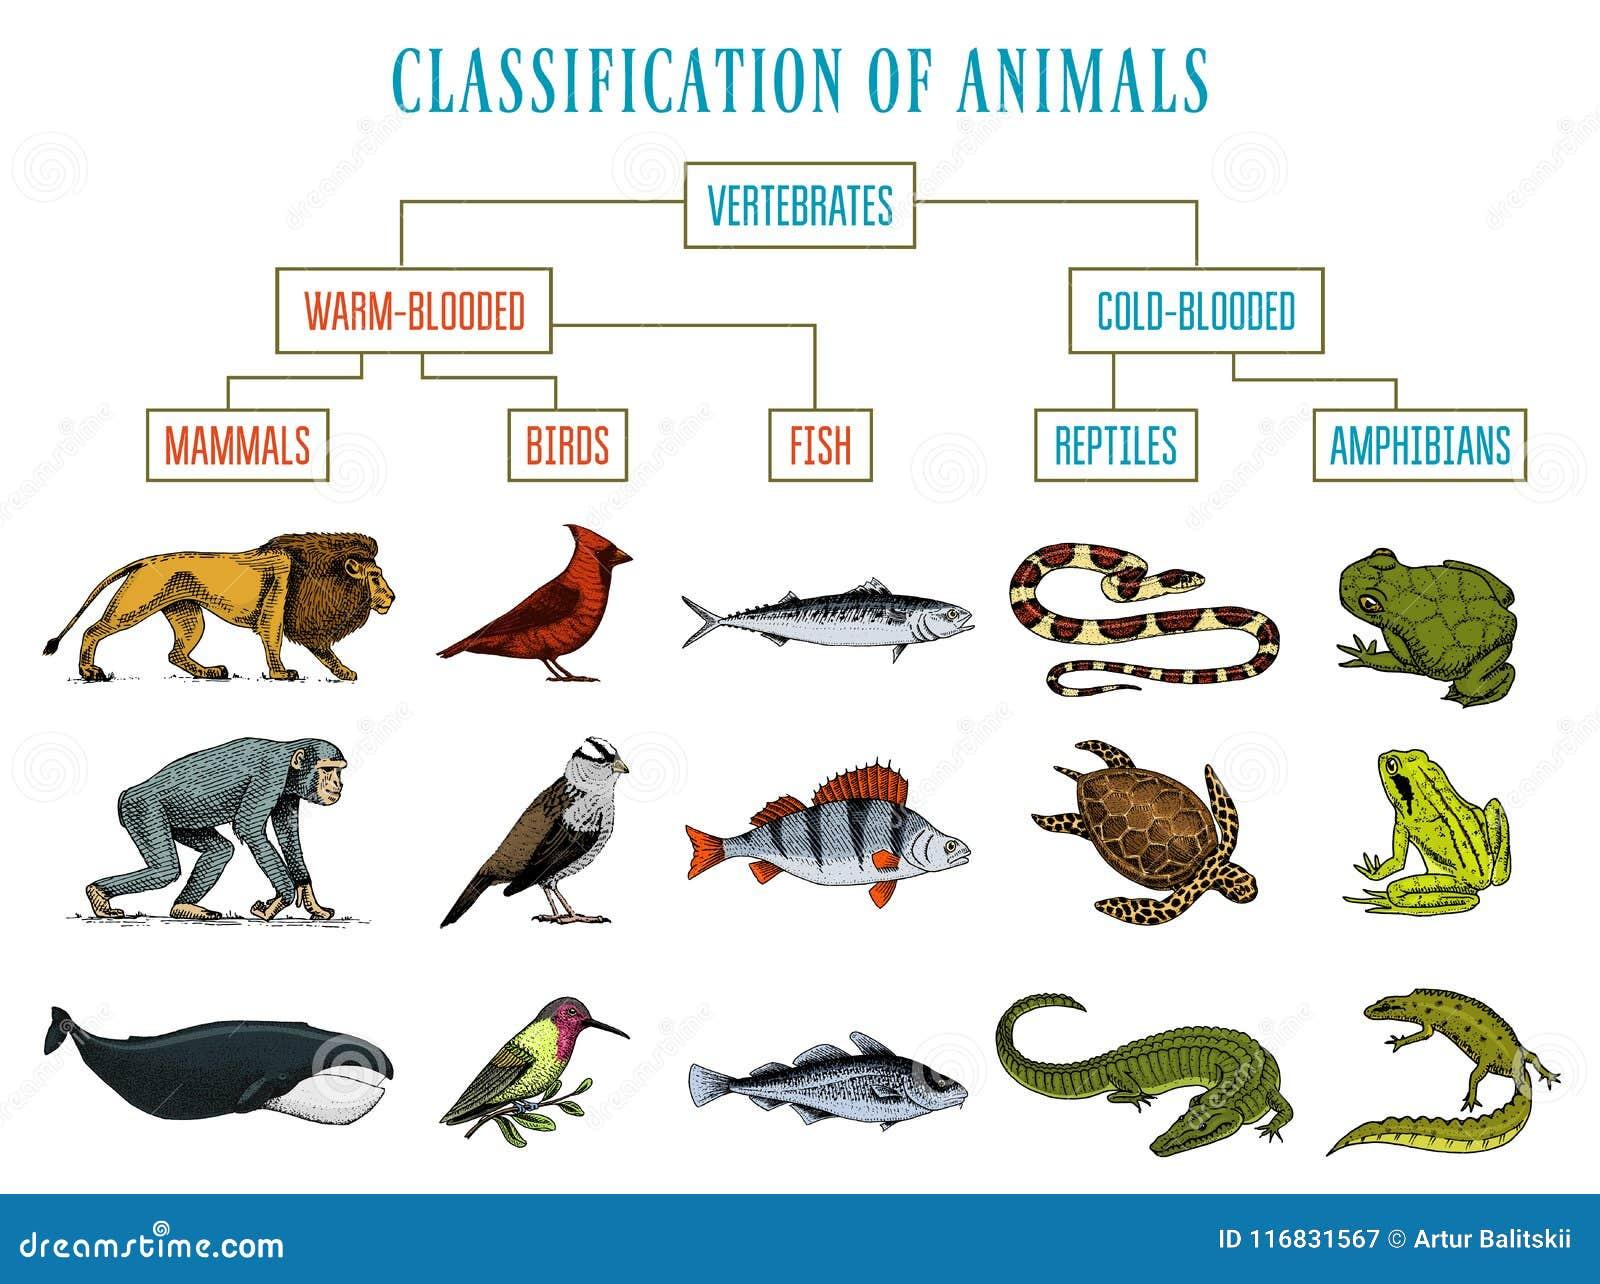 Classification Of Animals. Reptiles Amphibians Mammals Birds. Crocodile  Fish Lion Whale Snake Frog. Education Diagram Of Stock Vector -  Illustration of fish, animal: 116831567